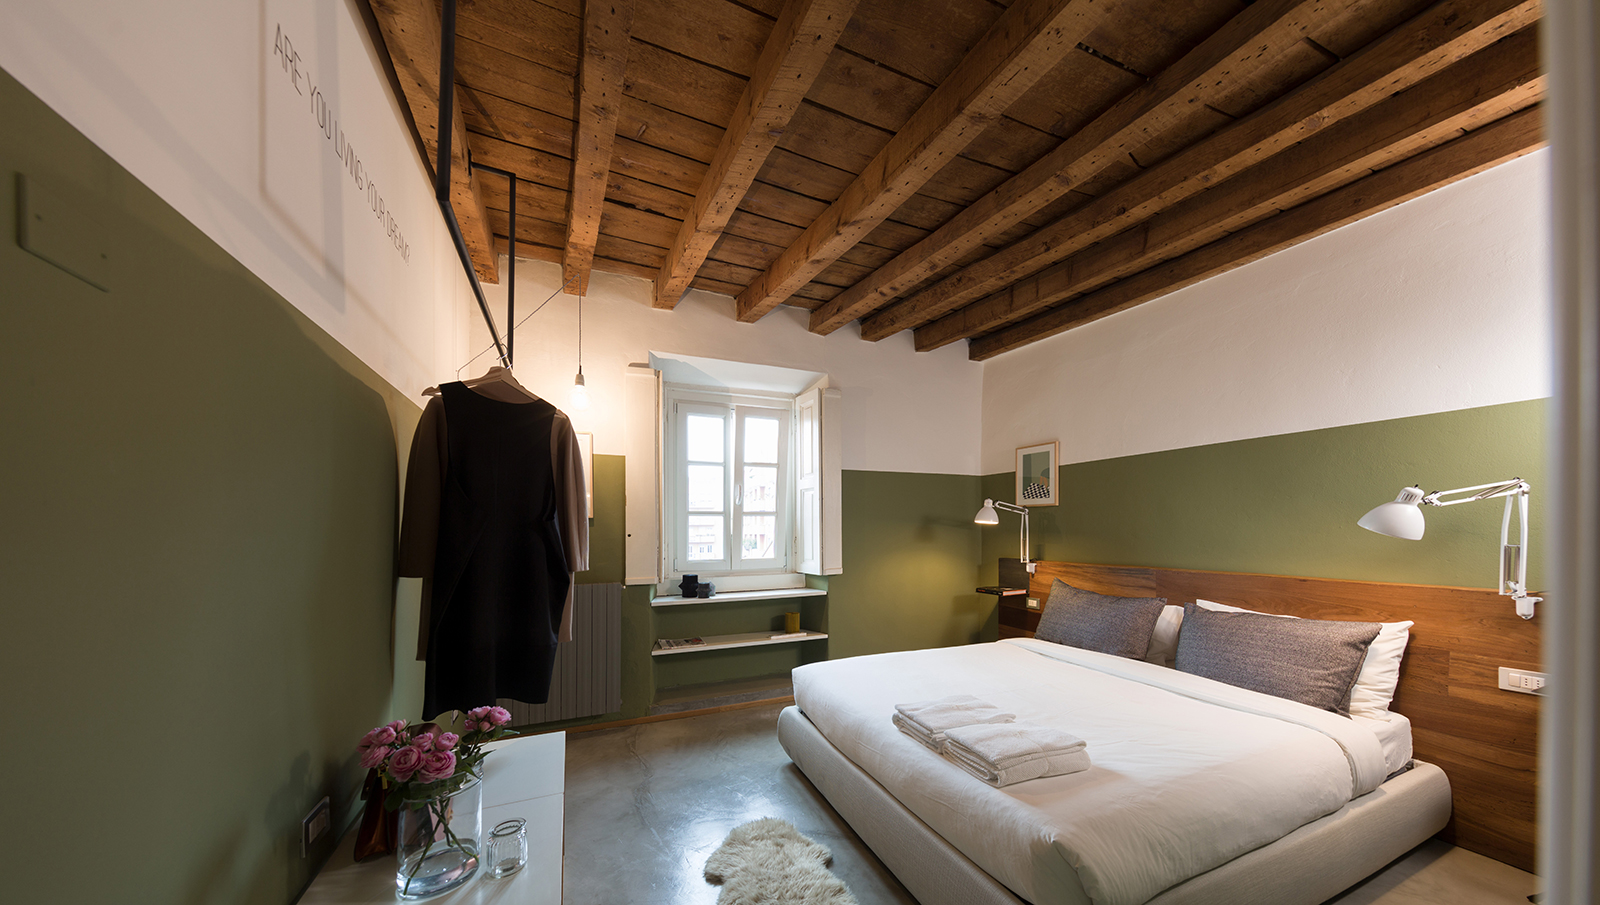 Milan aparment for rent: Artist's loft by onstanza Cecchini